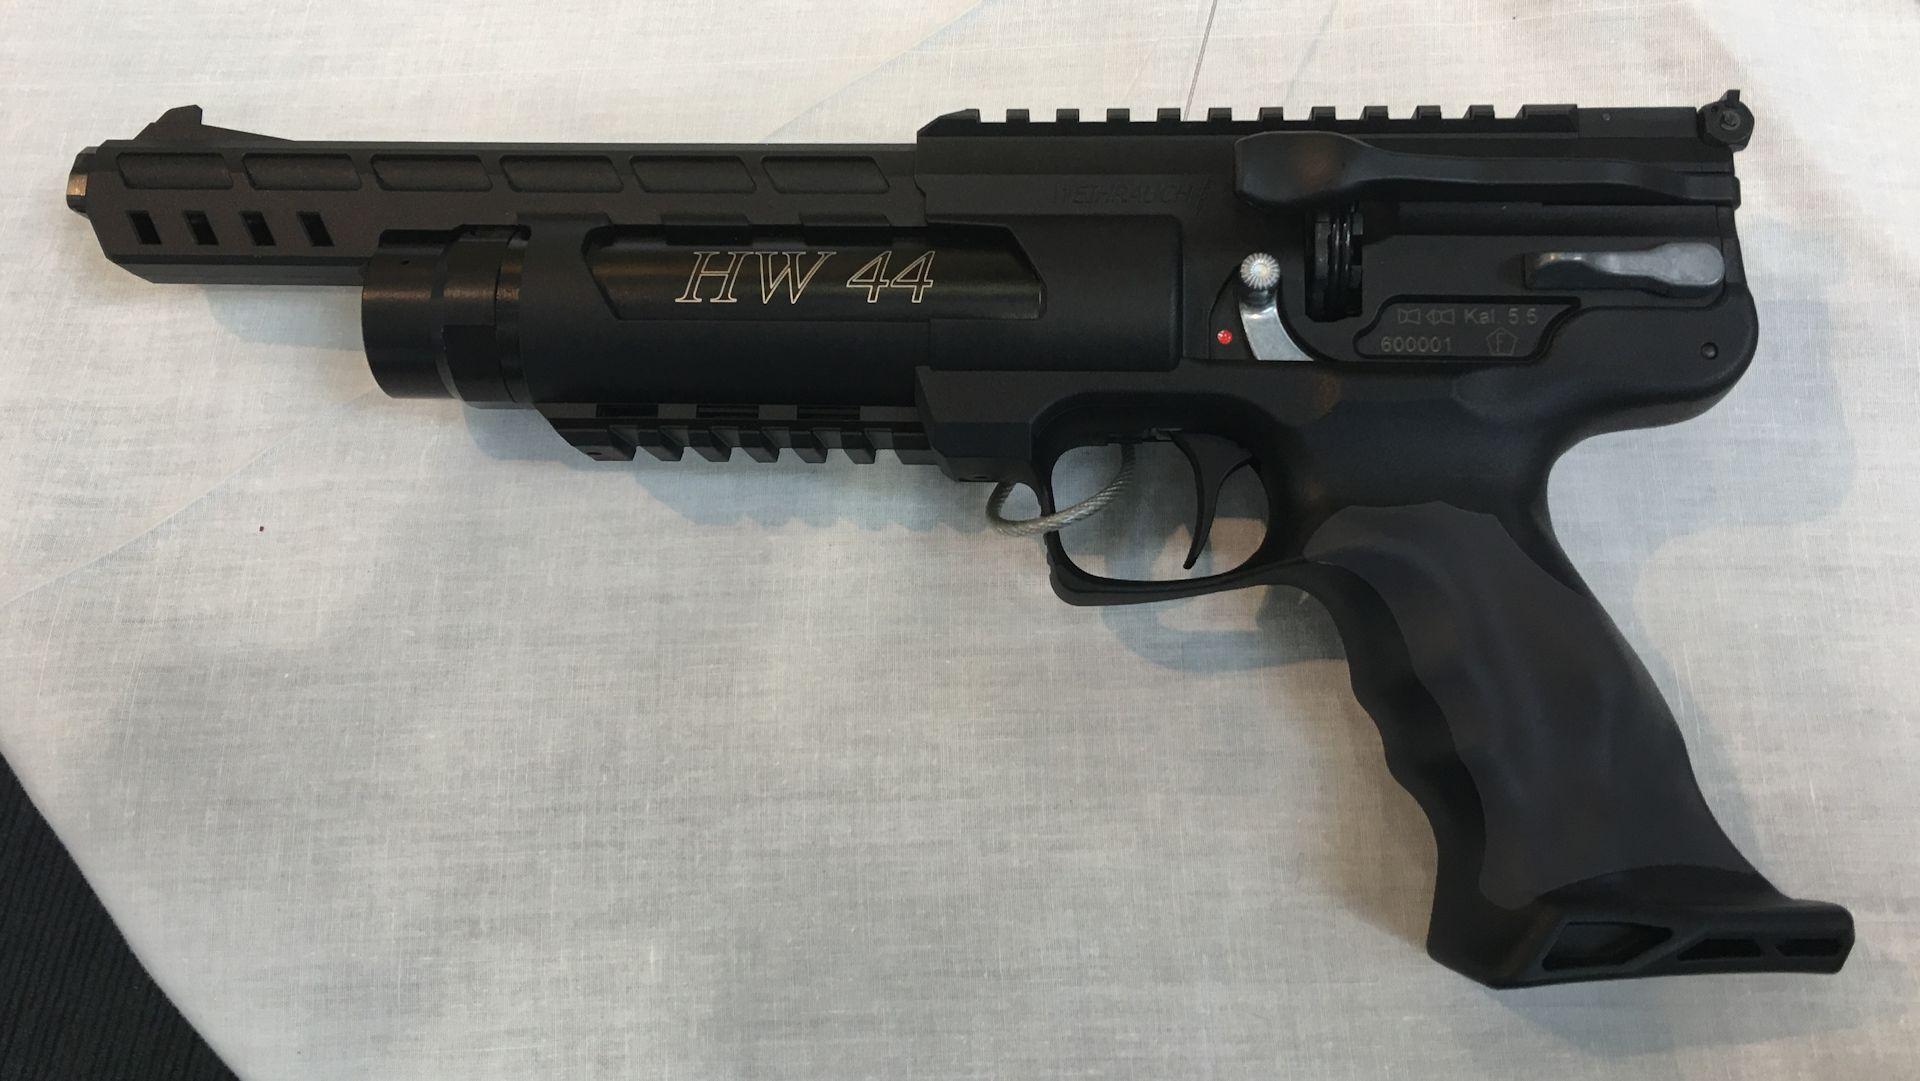 Luftpistole HW 44 im Kaliber 4,5mm / F/ Linksausführung